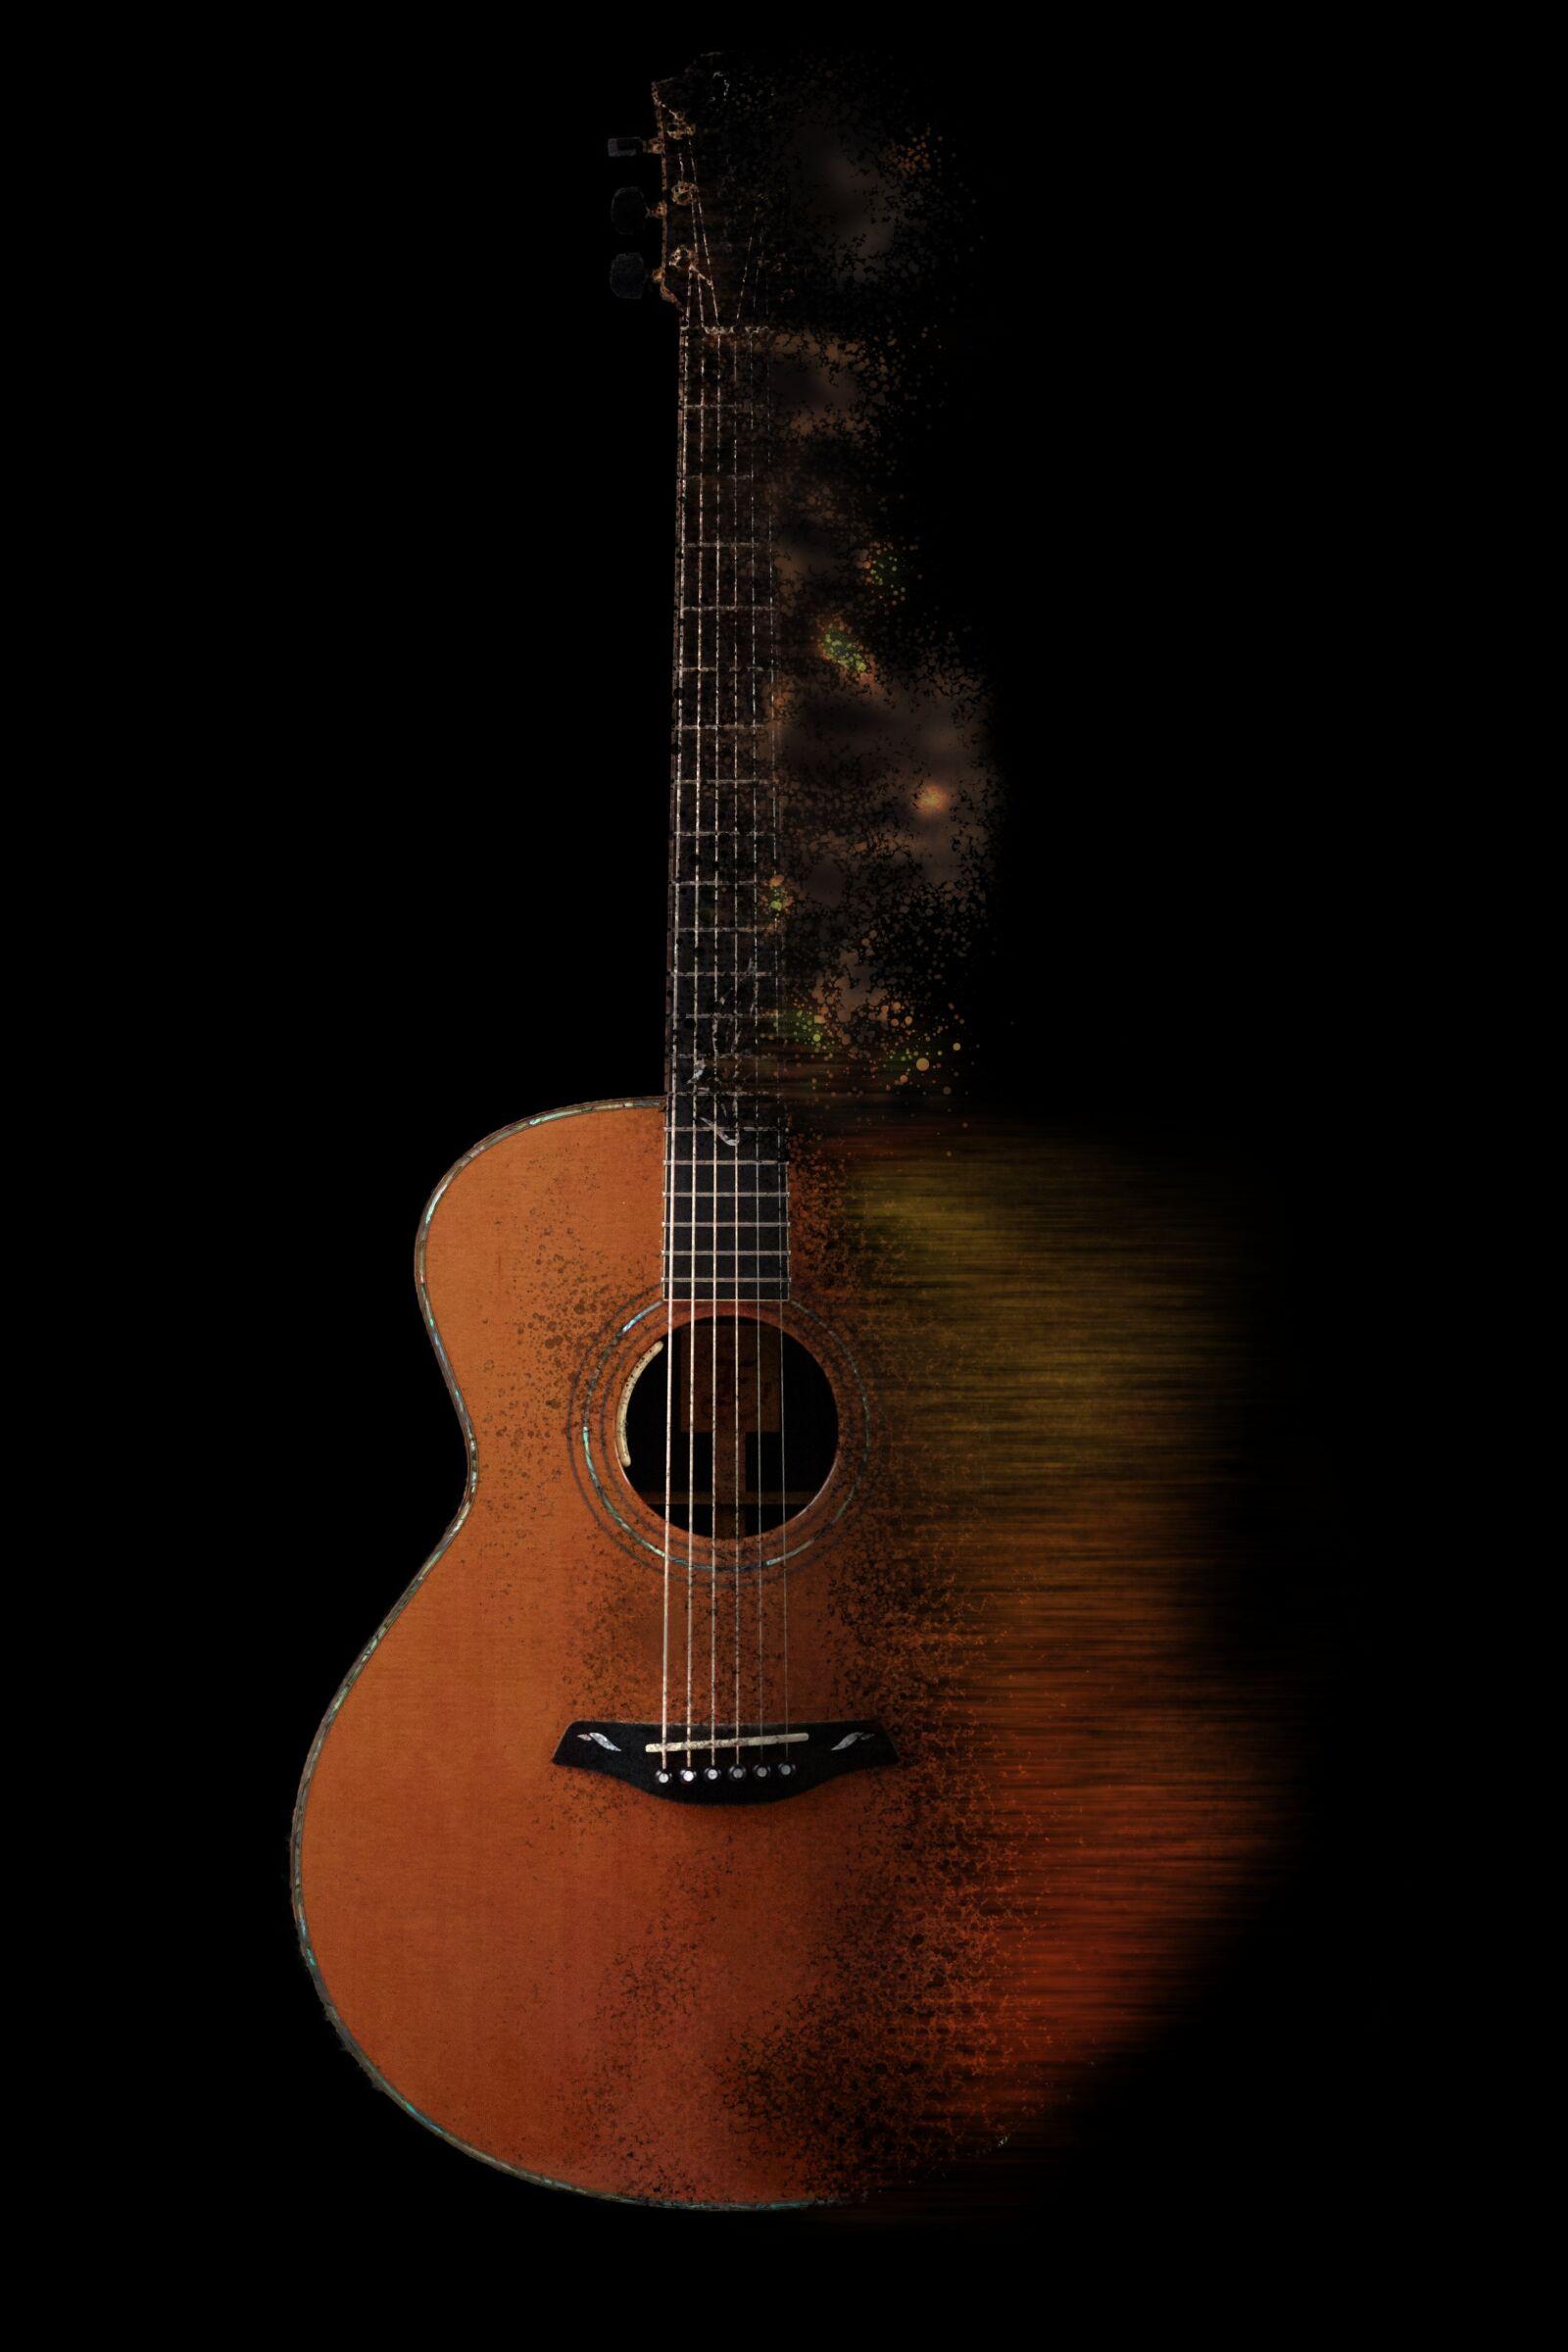 guitar, music, instrument